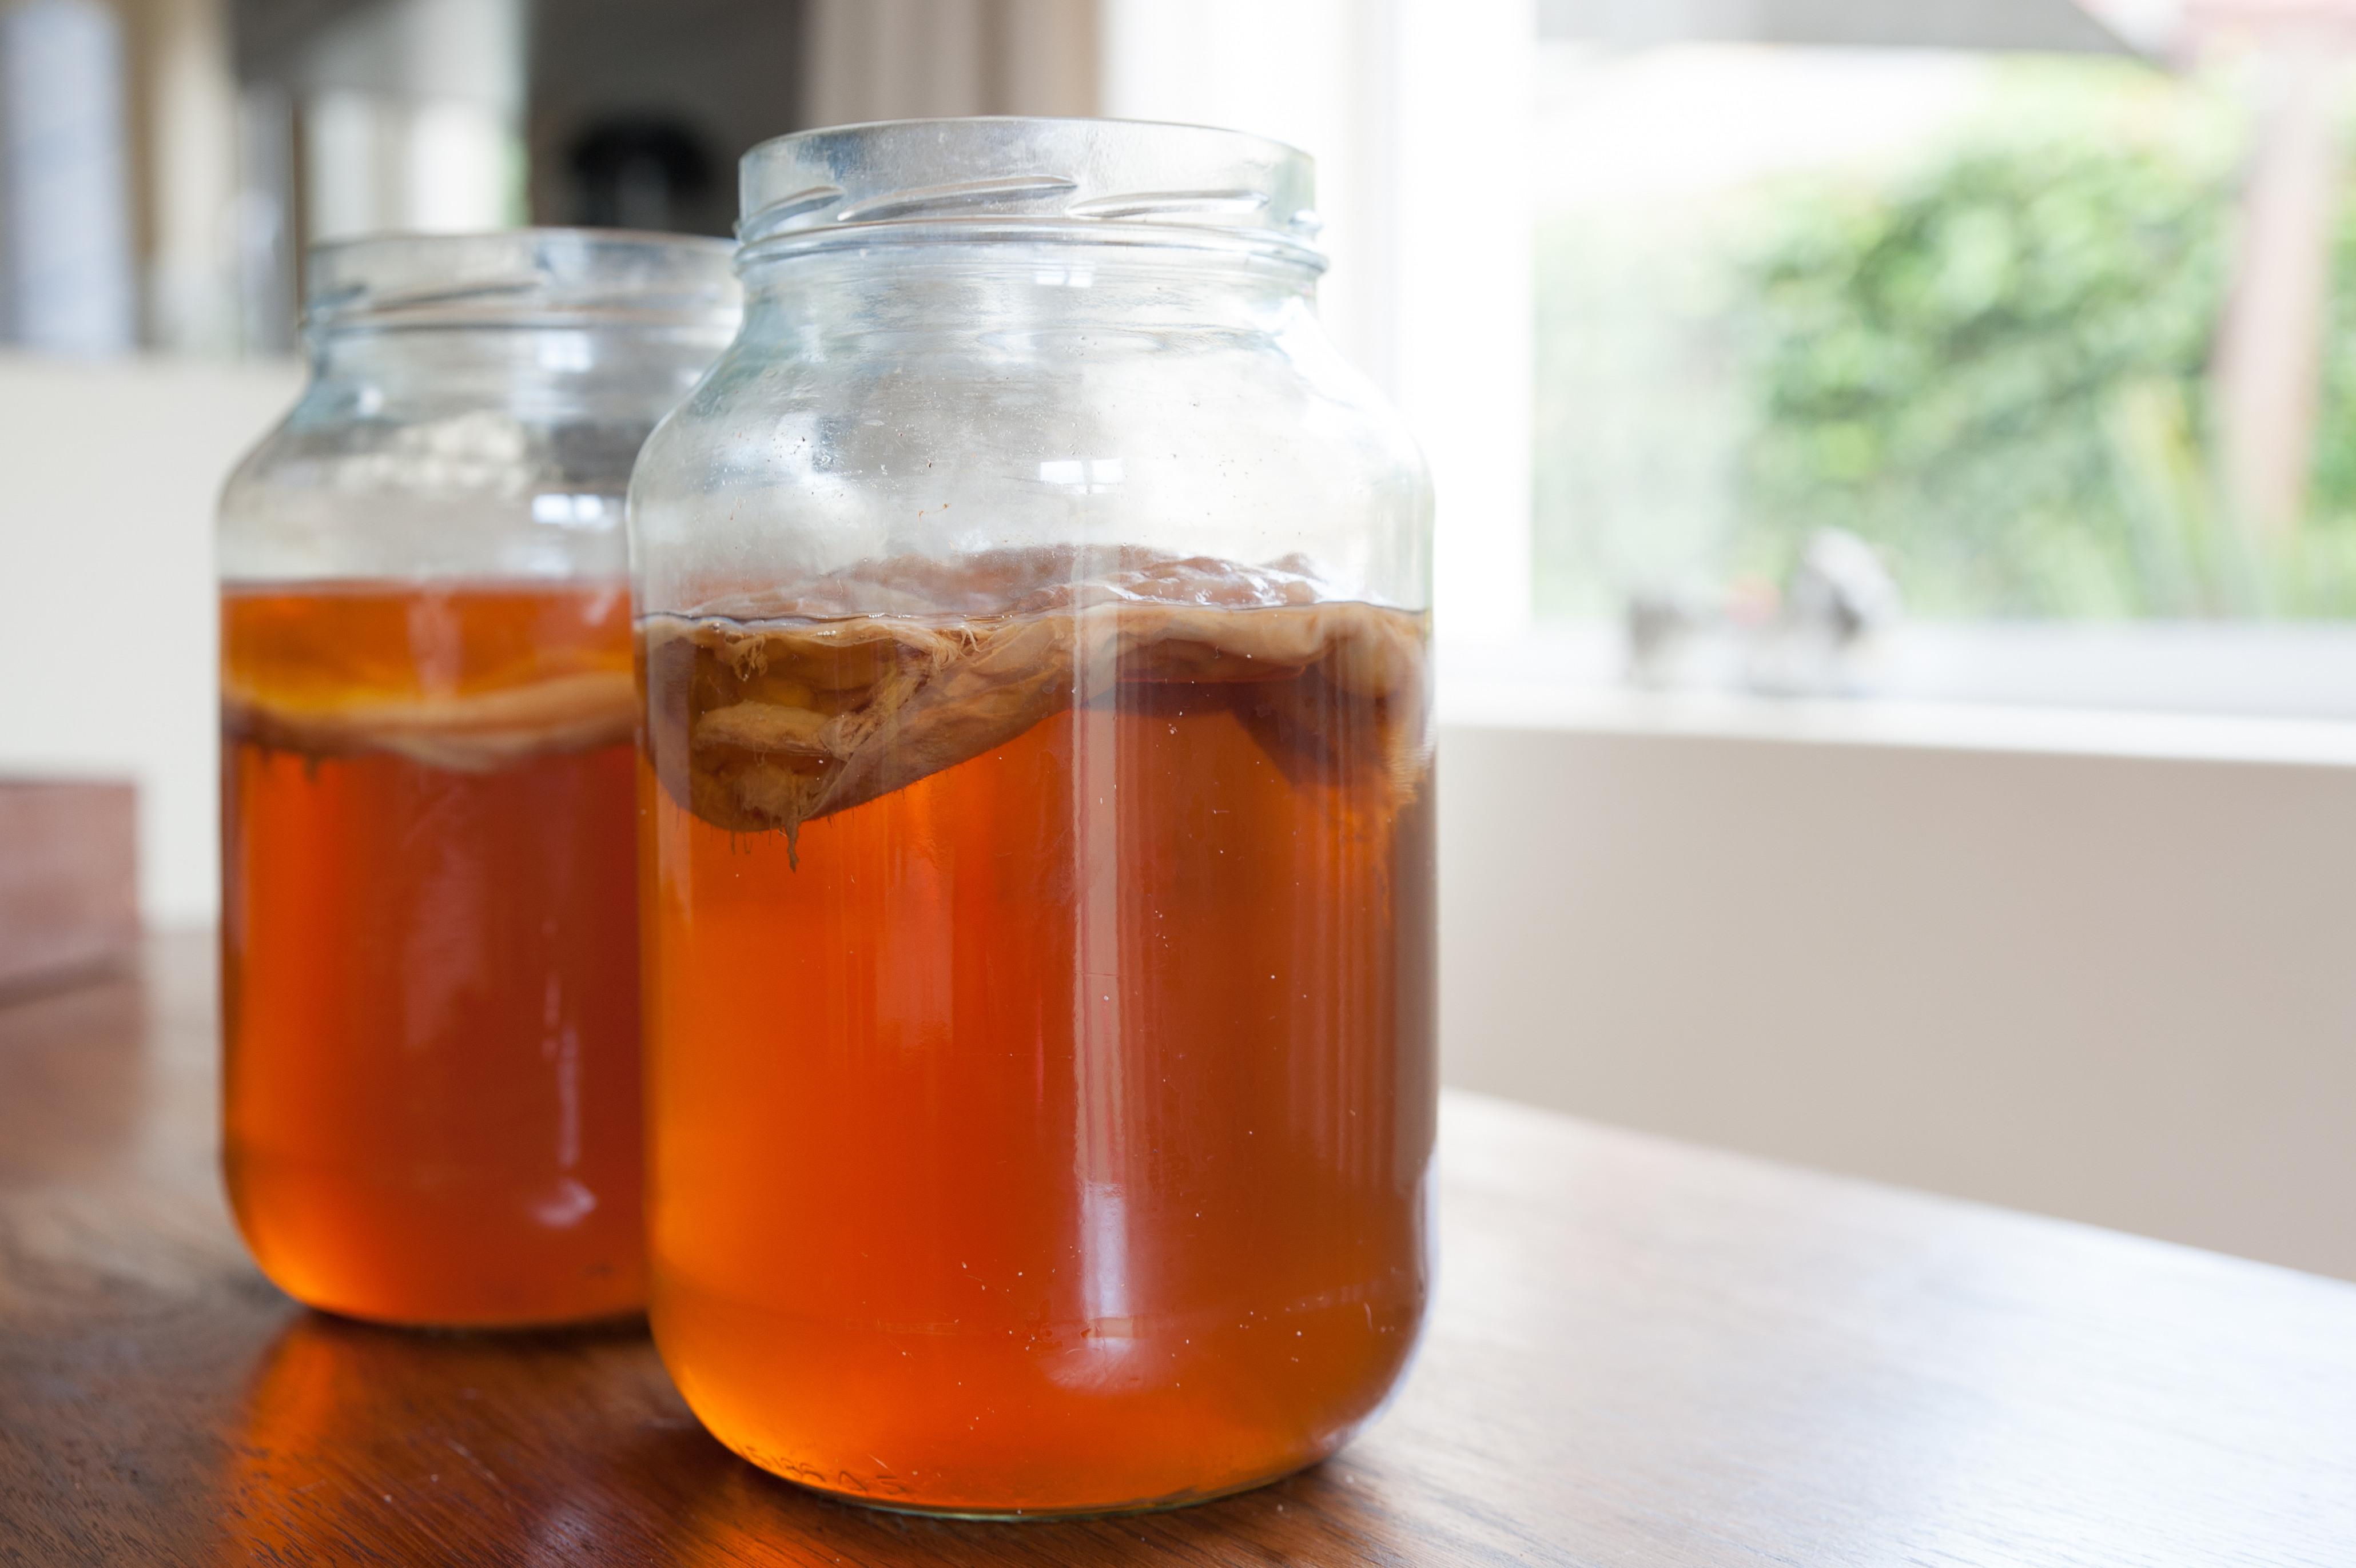 Fermentering - kombucha